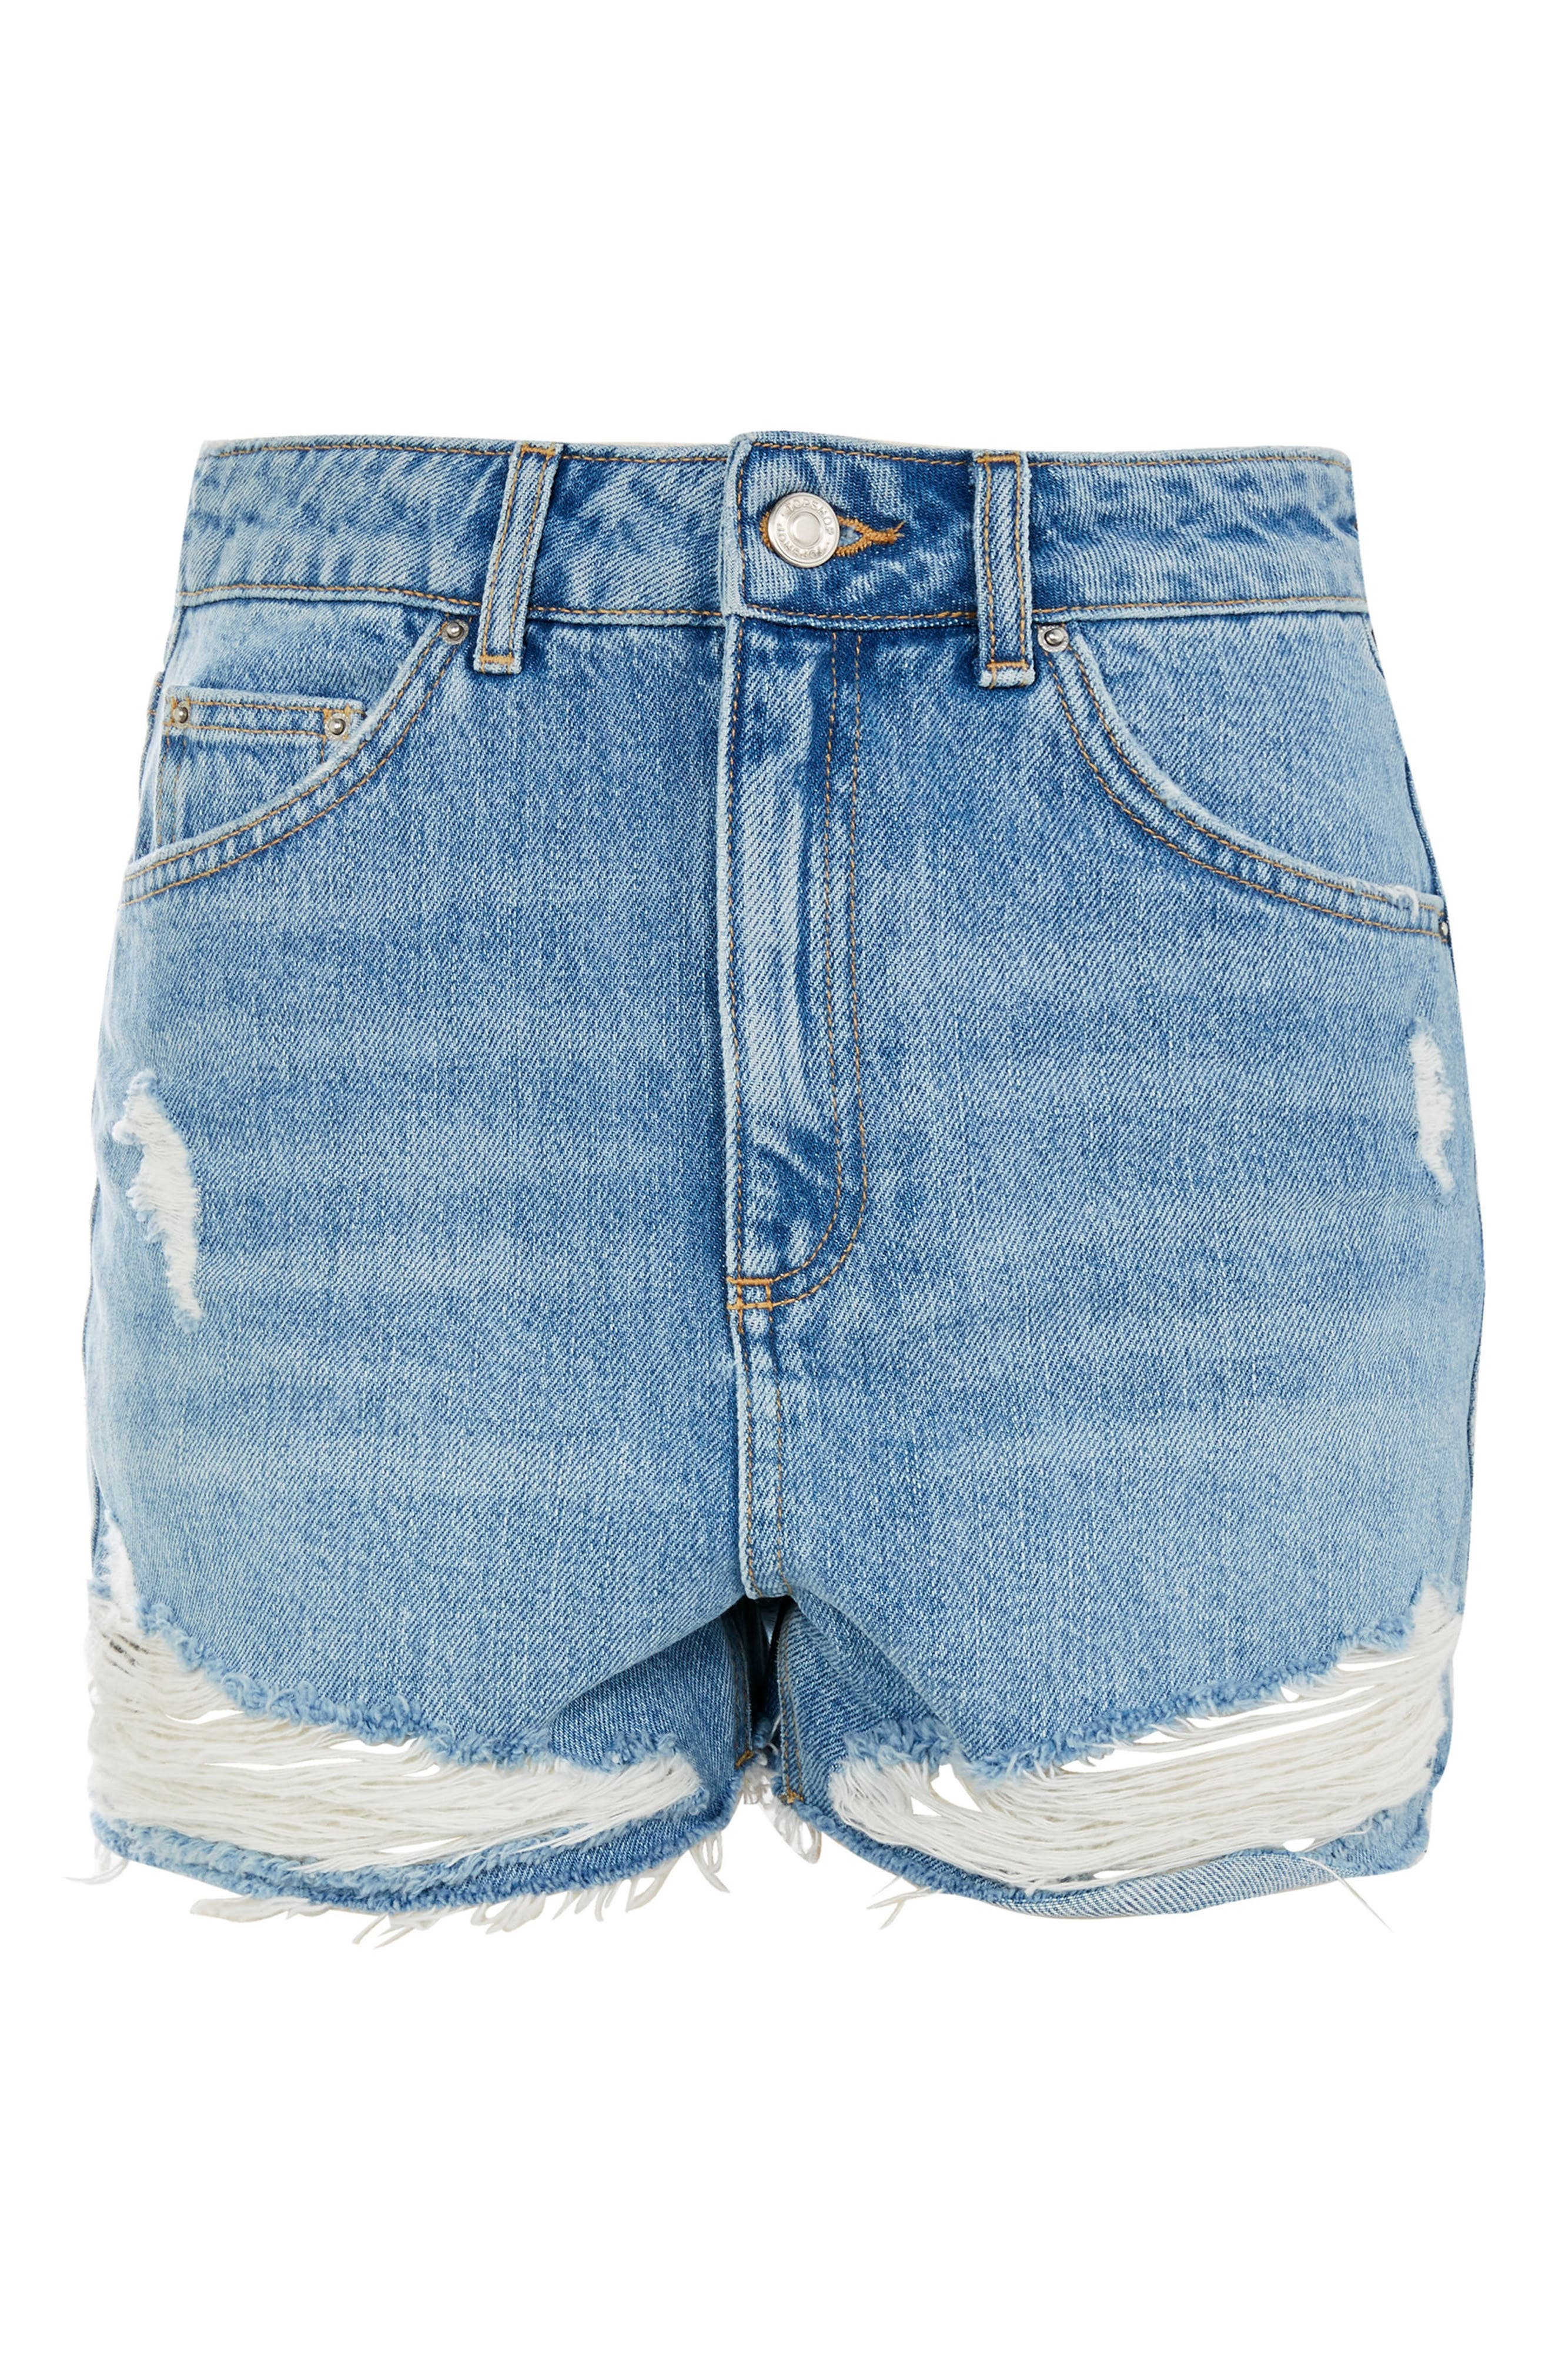 Ripped Denim Mom Shorts,                             Alternate thumbnail 3, color,                             400